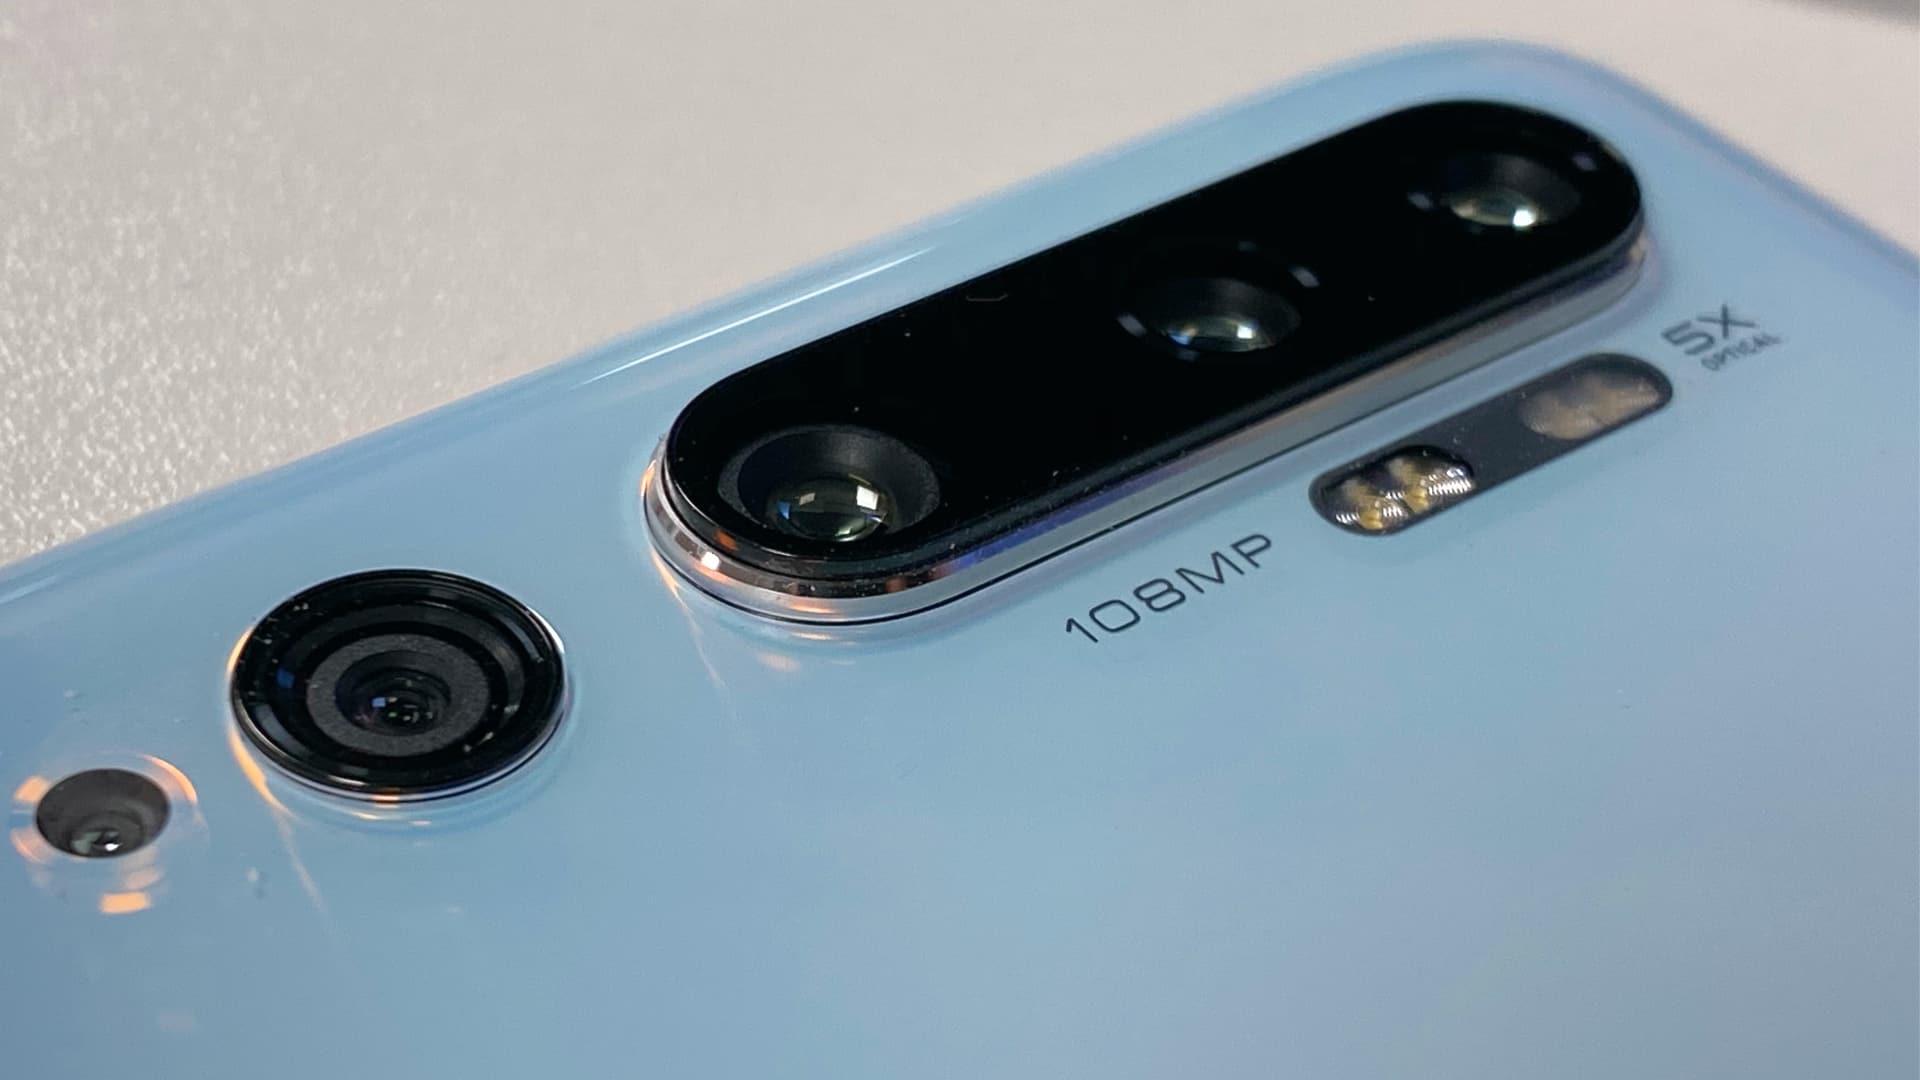 Bagsidekameraet på Xiaomi Mi Note 10